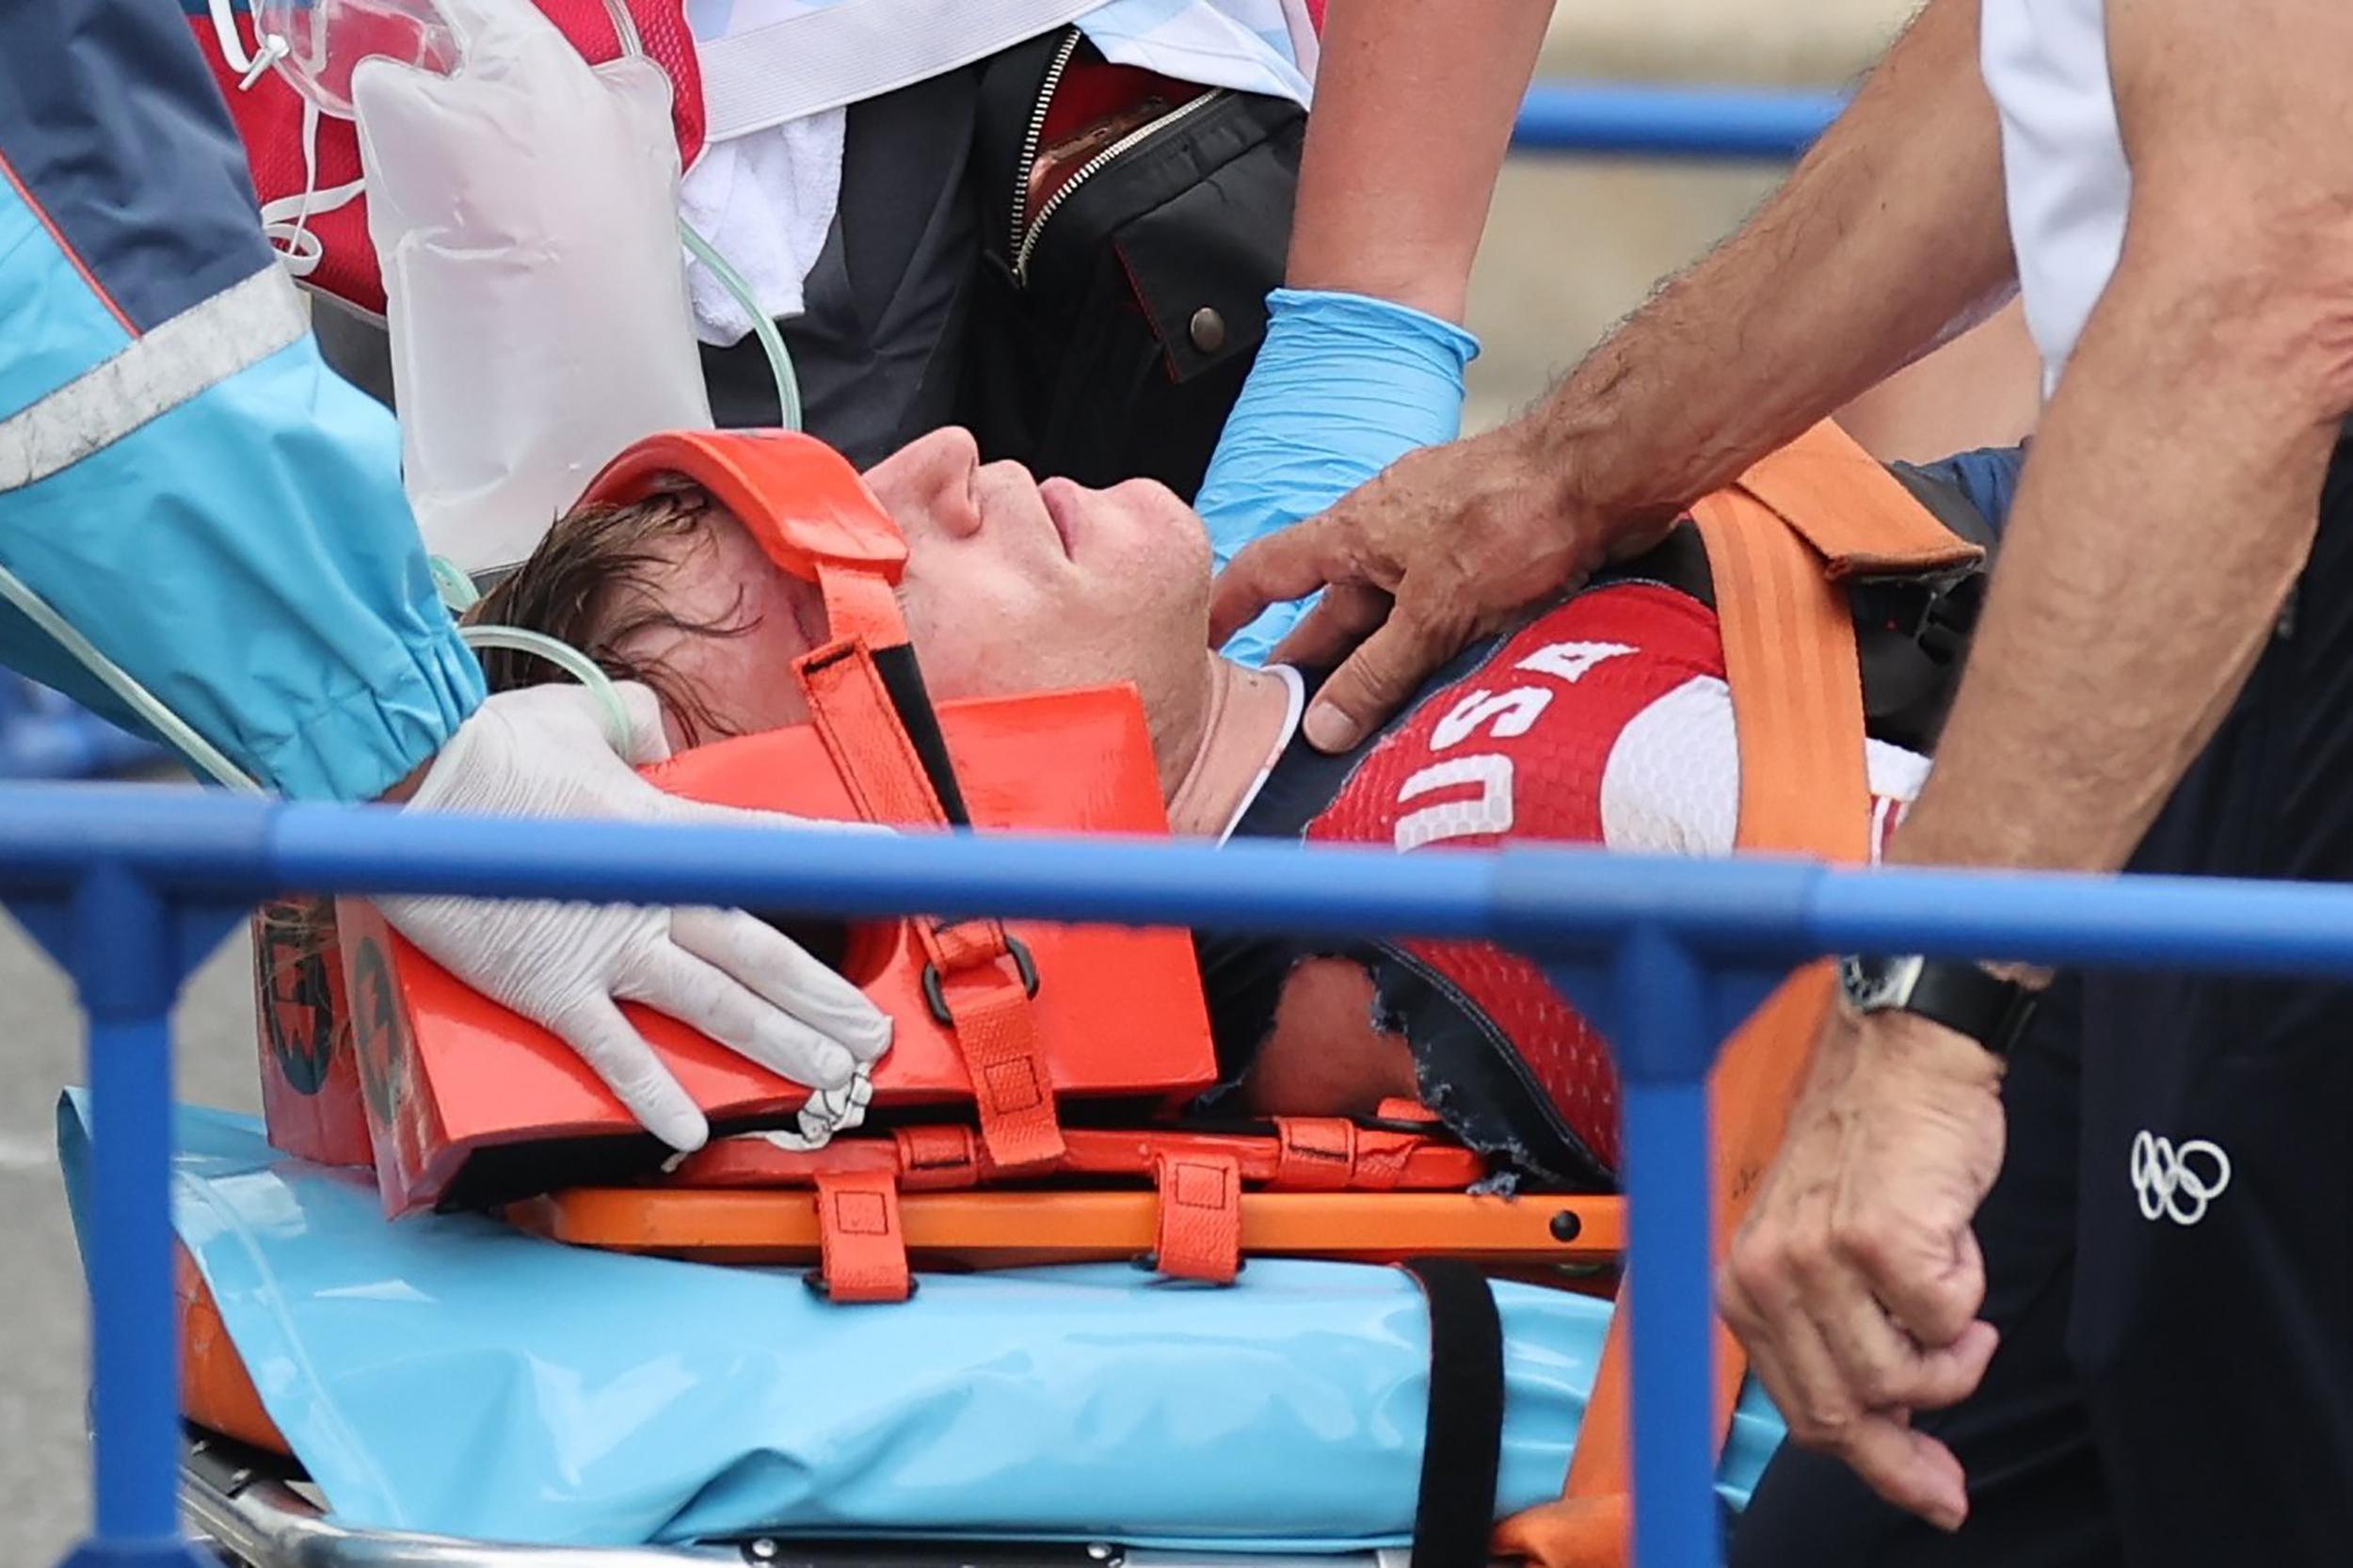 U.S. BMX racer Connor Fields carried off on stretcher after crash